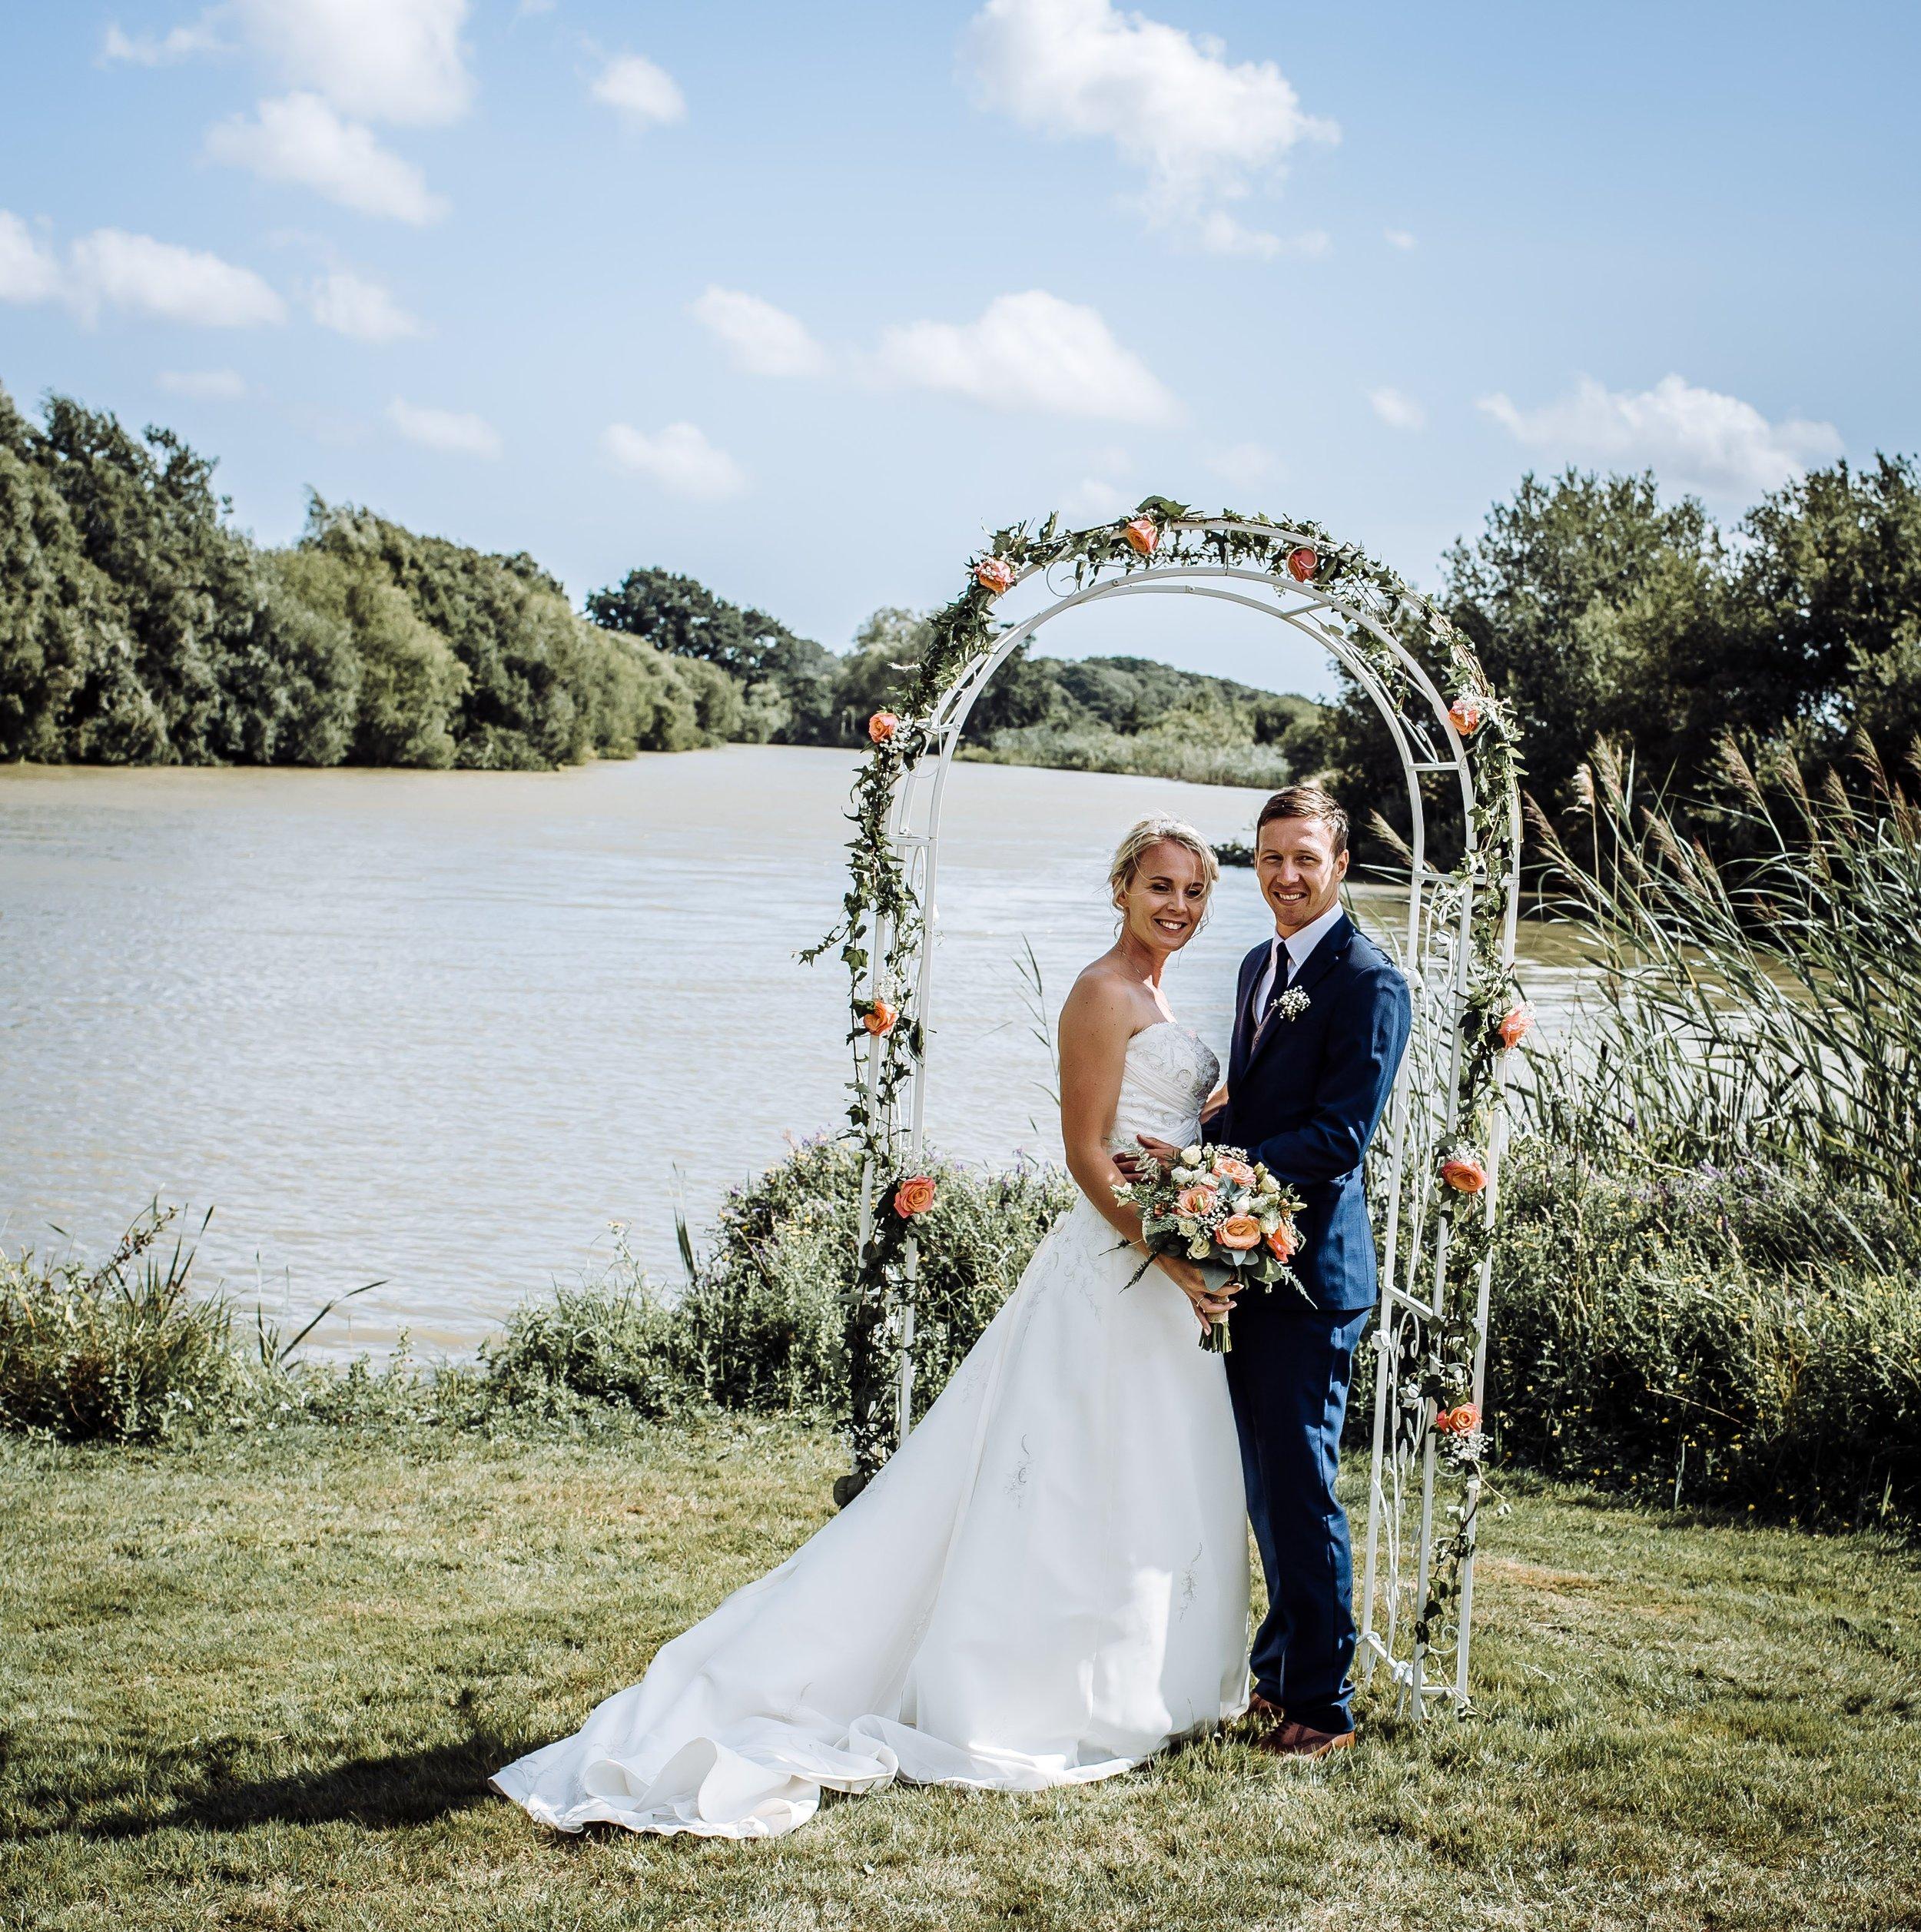 Vintage Wedding - East Sussex Wedding Photographer_0088.jpg